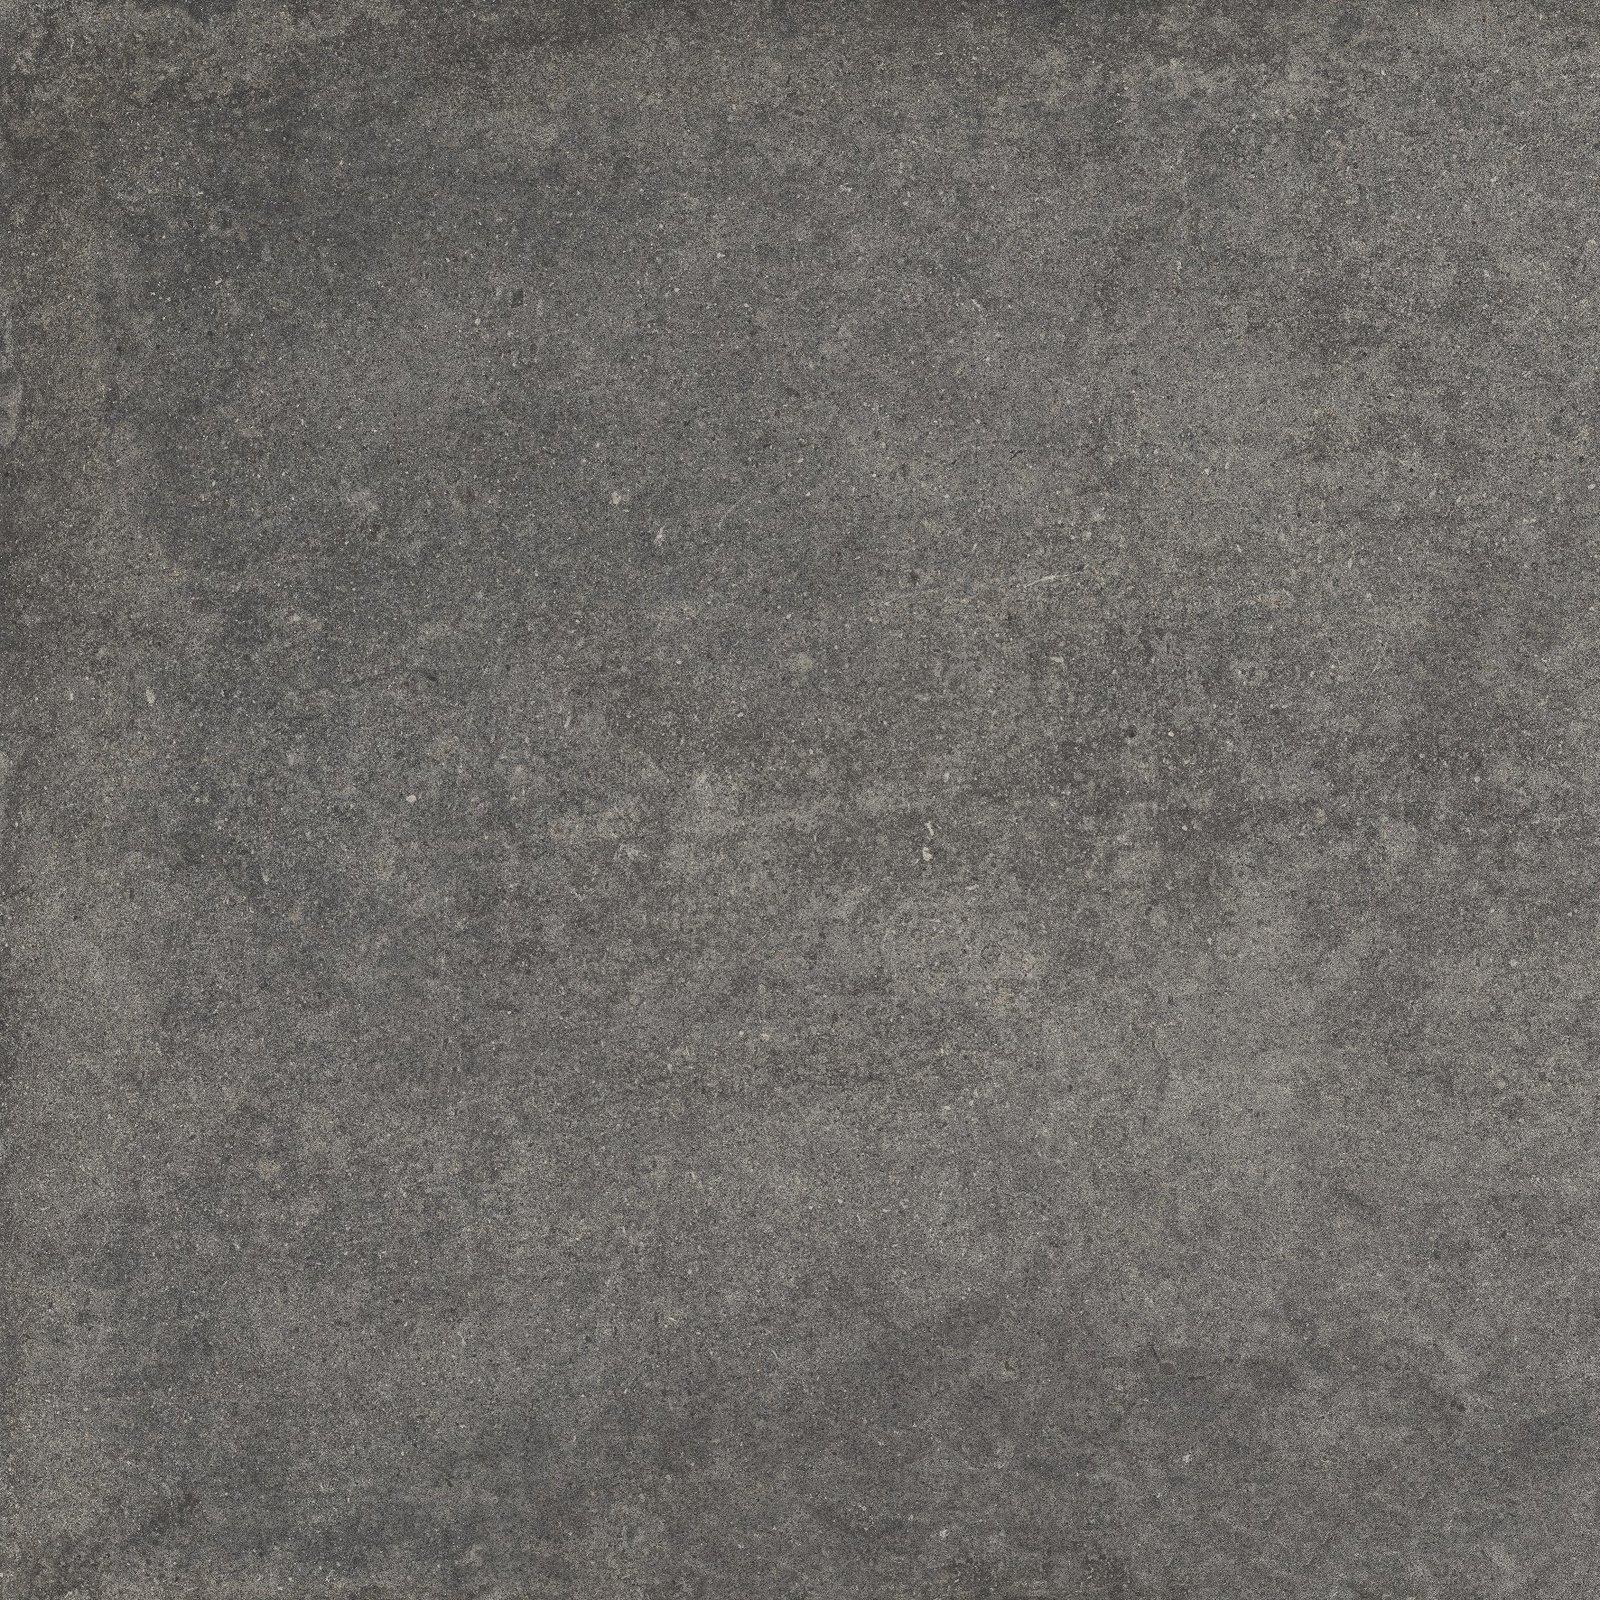 Плитка BLACK (X60RM9R) изображение 2